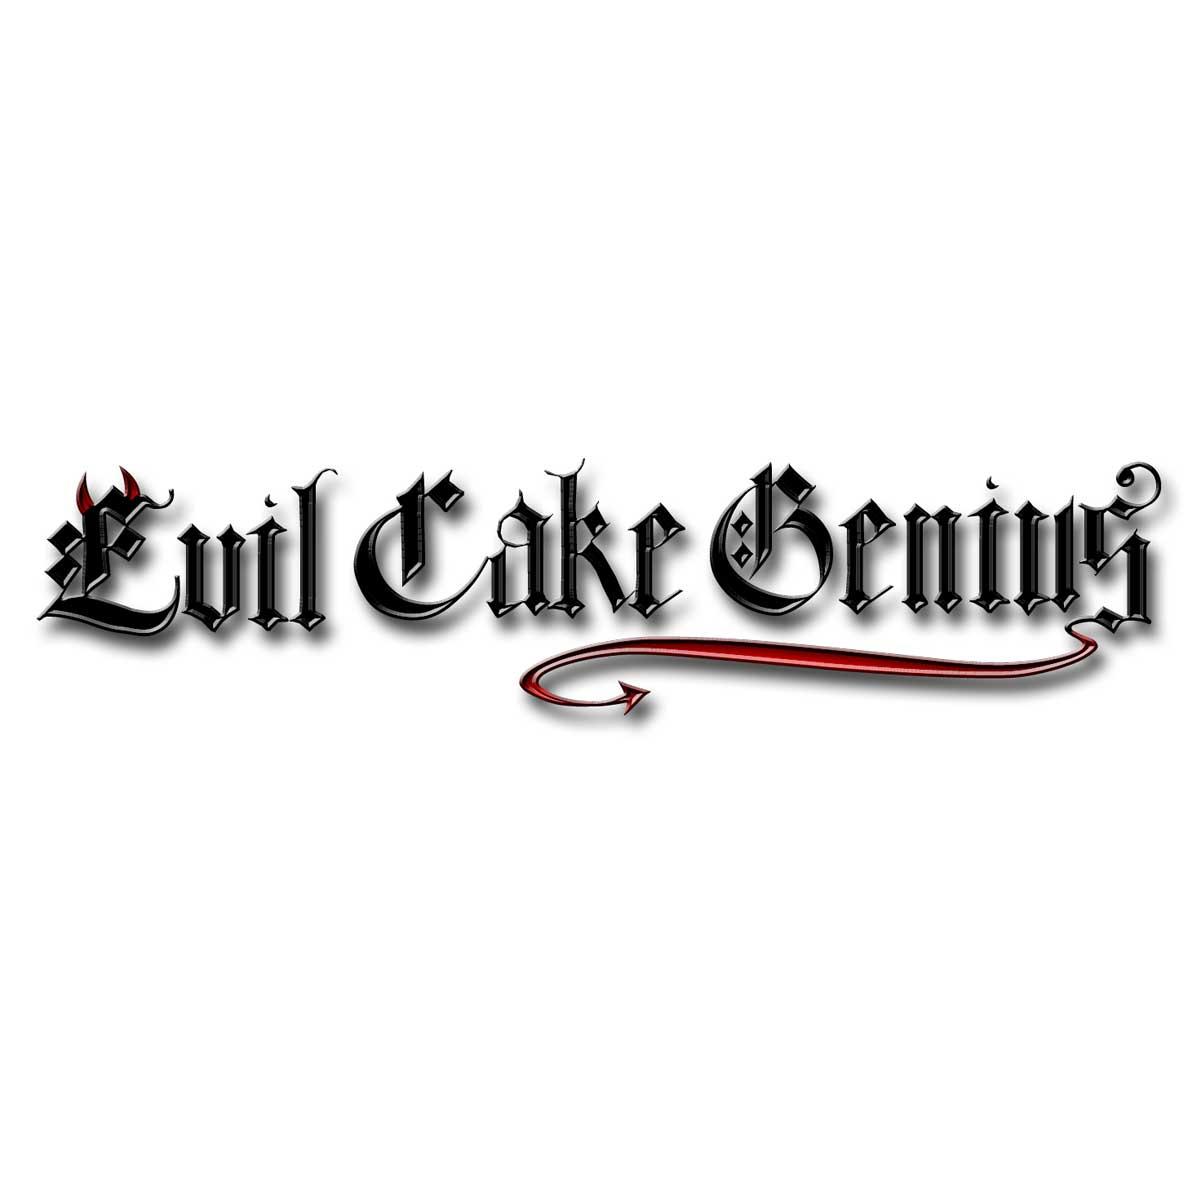 Mold Clam Shell Xl Evil Cake Genius